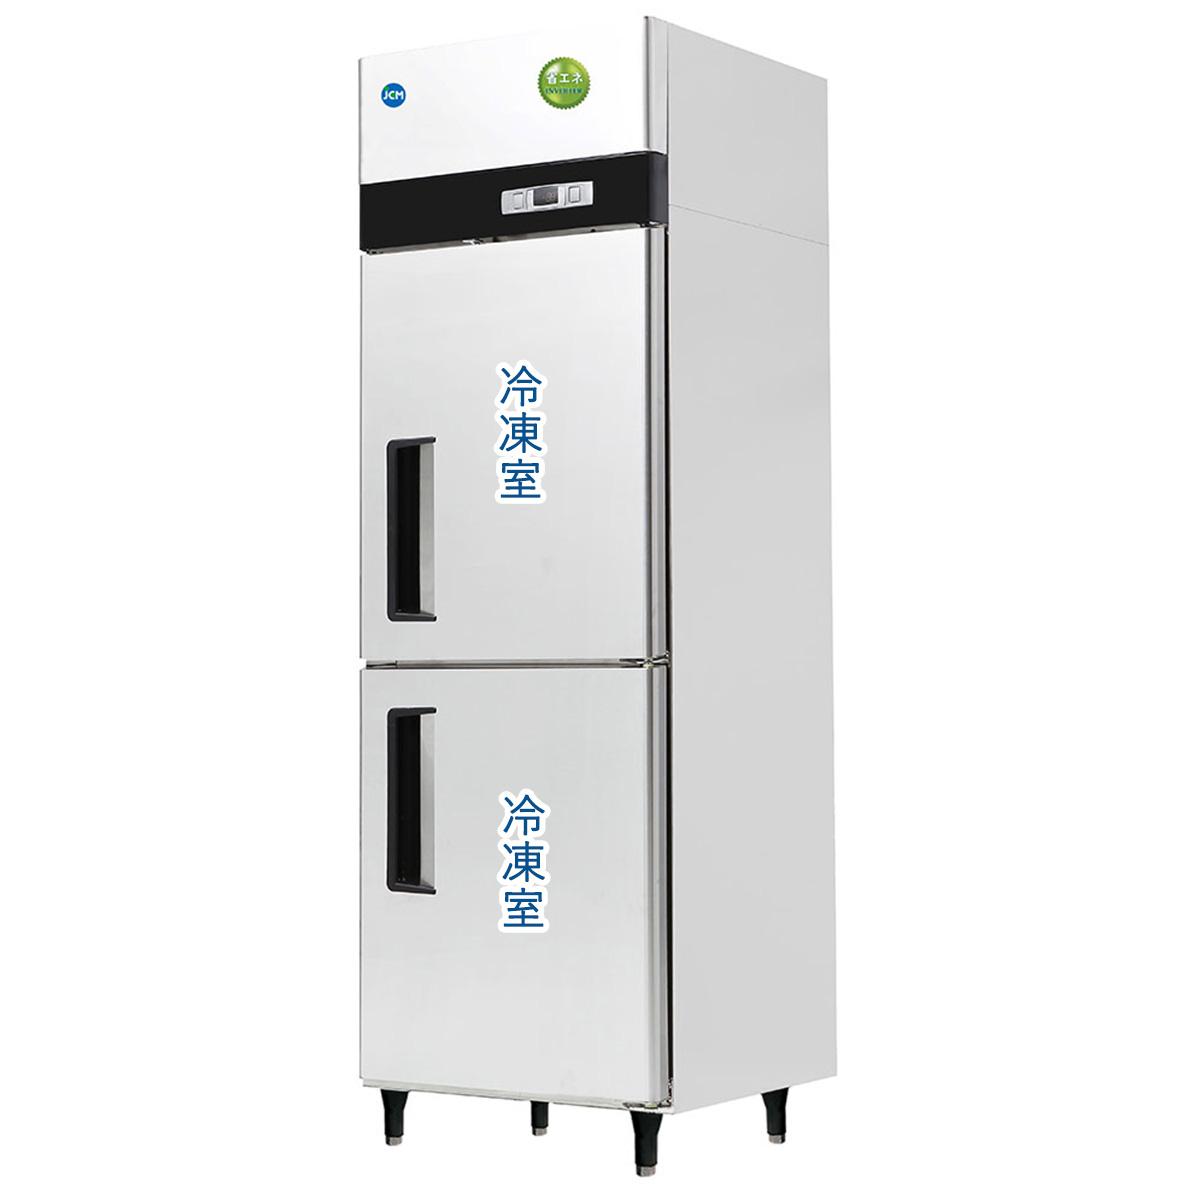 JCM タテ型 冷凍庫 JCMF-680-I 業務用 冷凍 2ドア 省エネ 【代引不可】